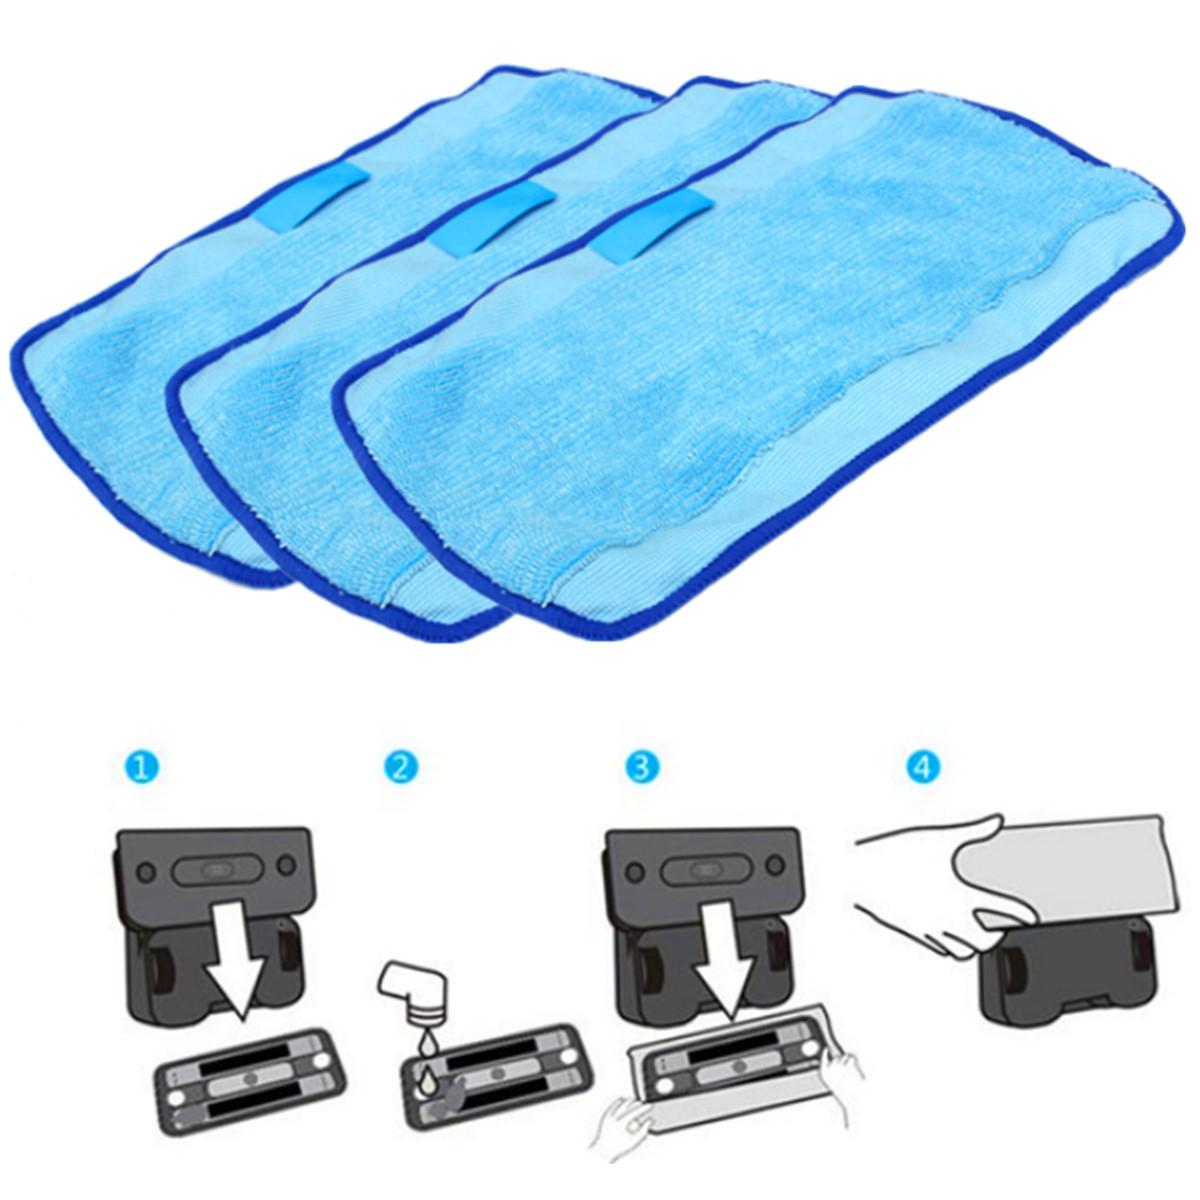 3Pcs Microfiber Mopping Cloths Spare Part for iRobot Braava 380t 320 Mint 4200 5200 Robot